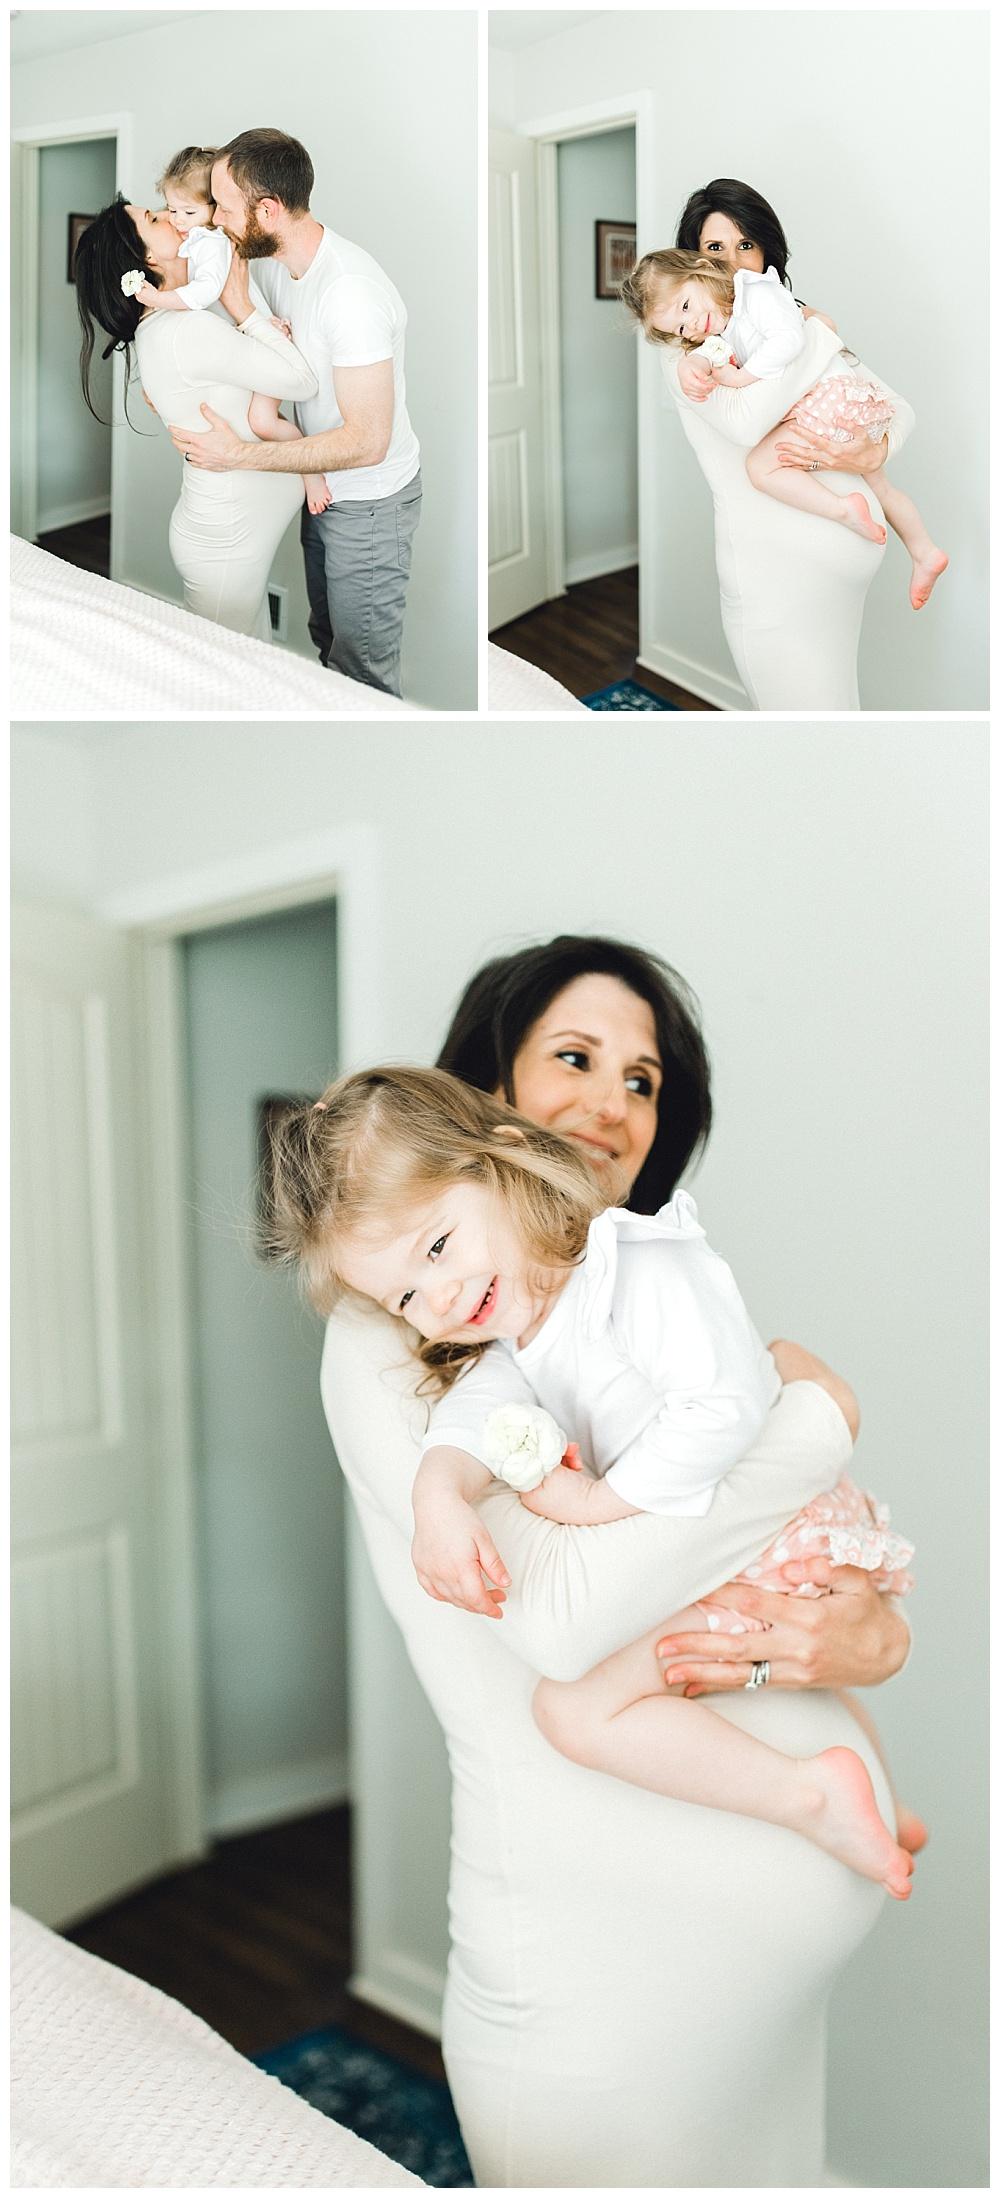 pregnant mother cradling her toddler girl in bedroom